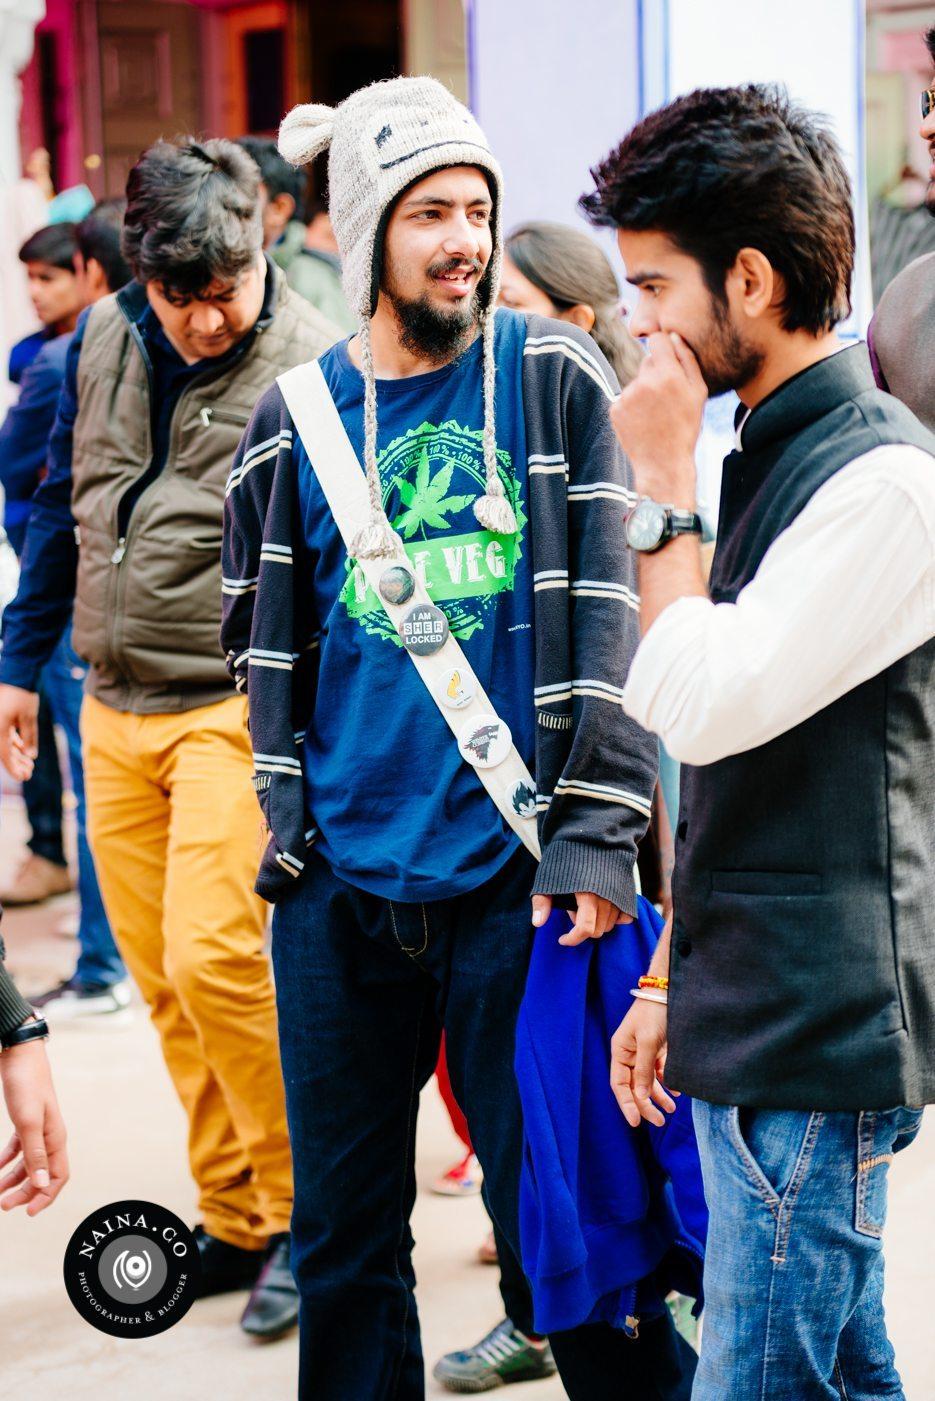 Naina.co-Raconteuse-Visuelle-Photographer-Blogger-Storyteller-Luxury-Lifestyle-January-2015-Jaipur-Literature-Festival-StRegis-LeMeridien-ZeeJLF-EyesForStreetStyle-49